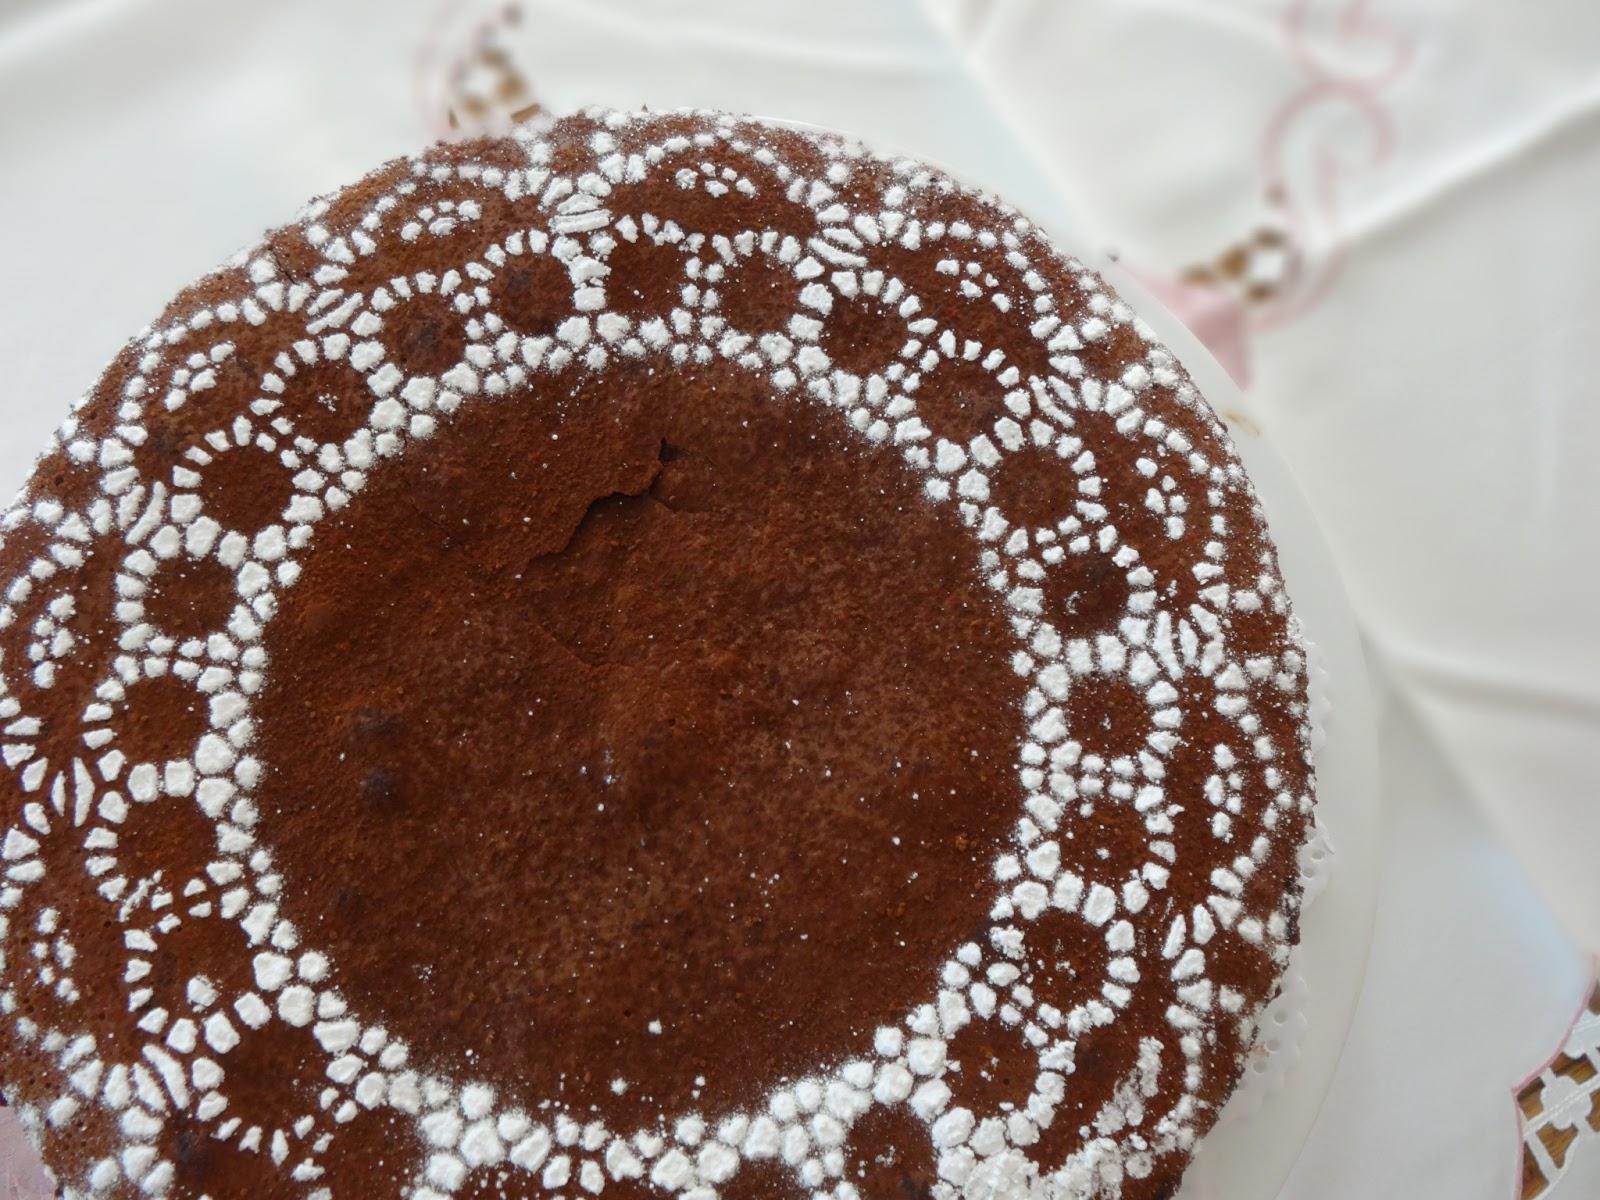 Rosie Bakes It Flourless Chocolate Cake